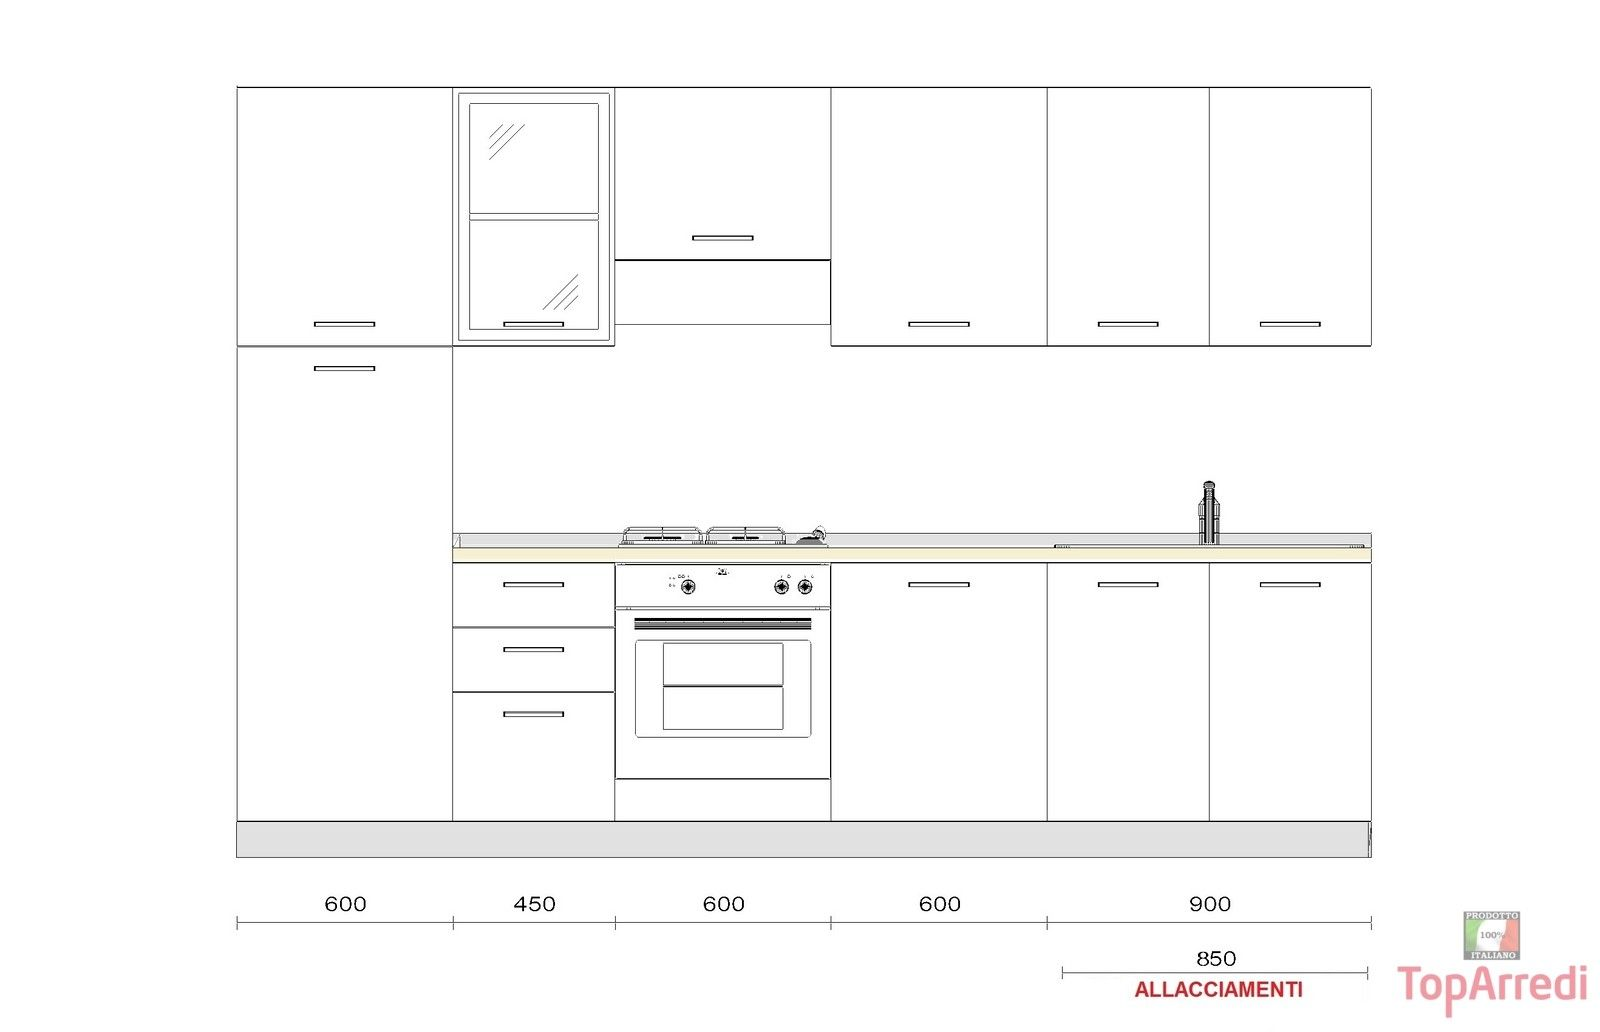 Misure cucina standard cerca con google abitare like - Cucina standard misure ...